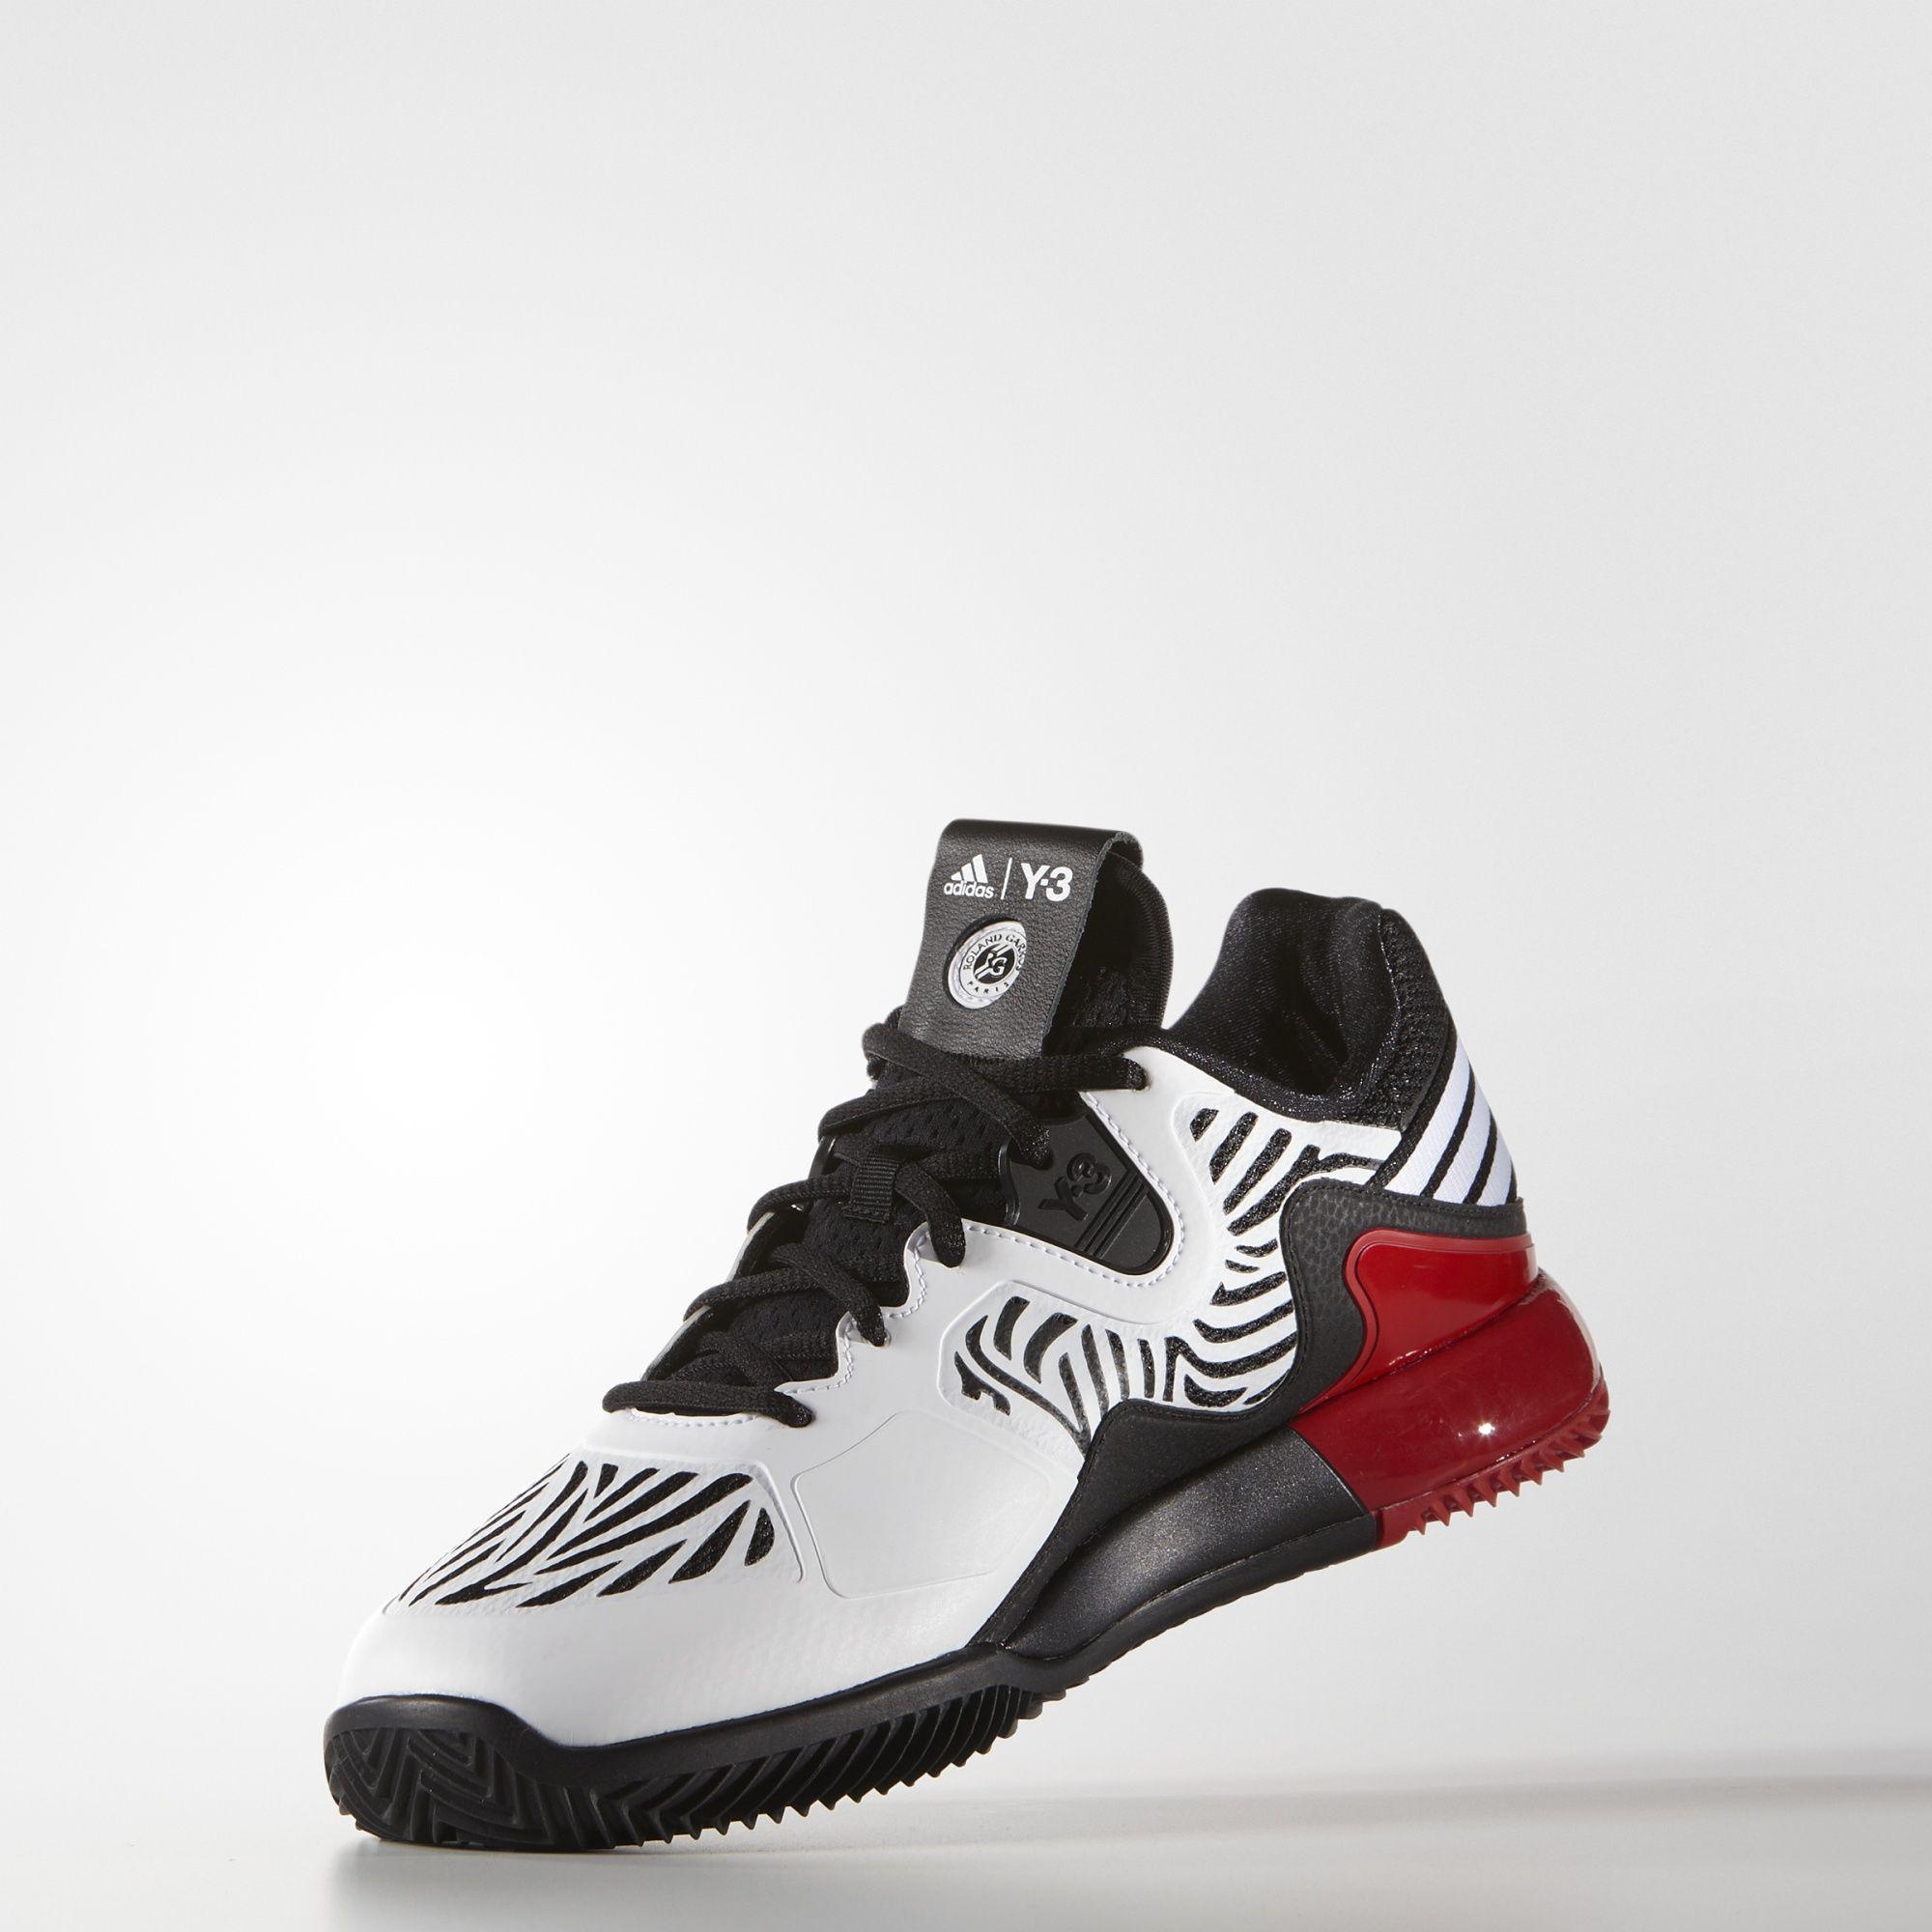 0af8873a5 Adidas Adizero Y3 2016 S78389 Herren Tennis Shoes Sport Shoes Turnschuhe